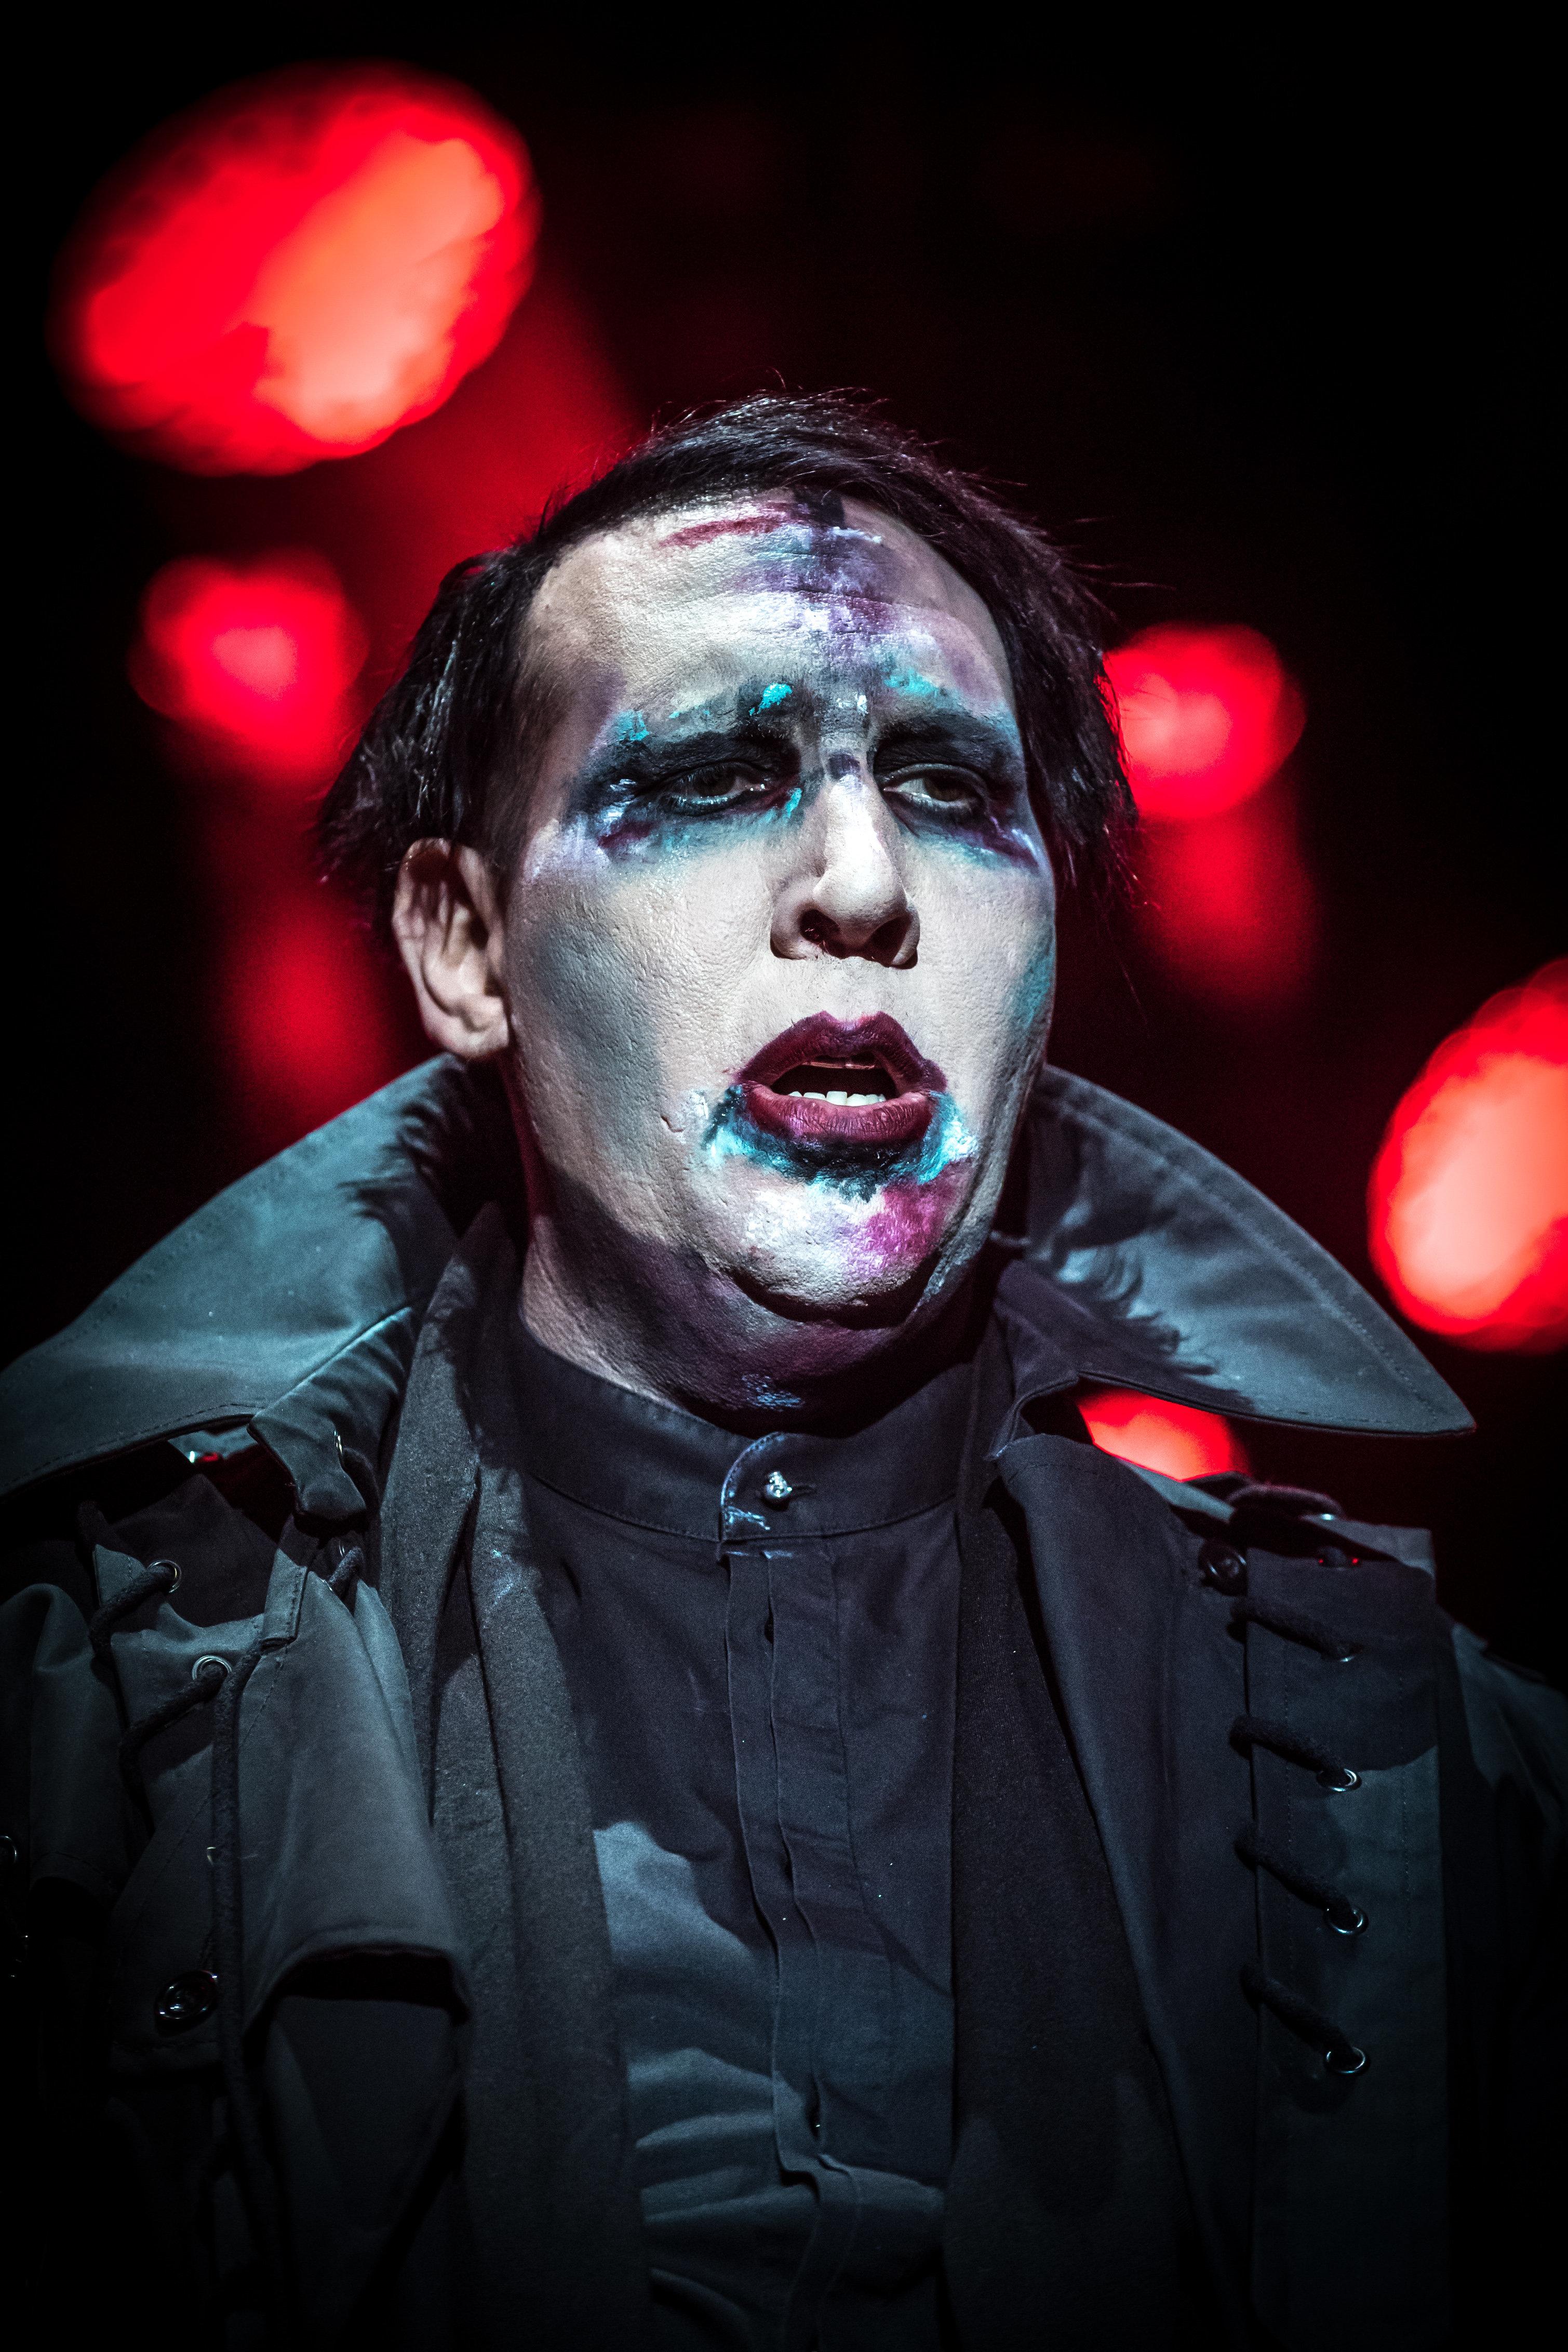 VILLAFRANCA DI VERONA, ITALY - JULY 26:  Marilyn Manson Performs on July 26, 2017 in Villafranca di Verona, Italy.  (Photo by Francesco Prandoni/Redferns)